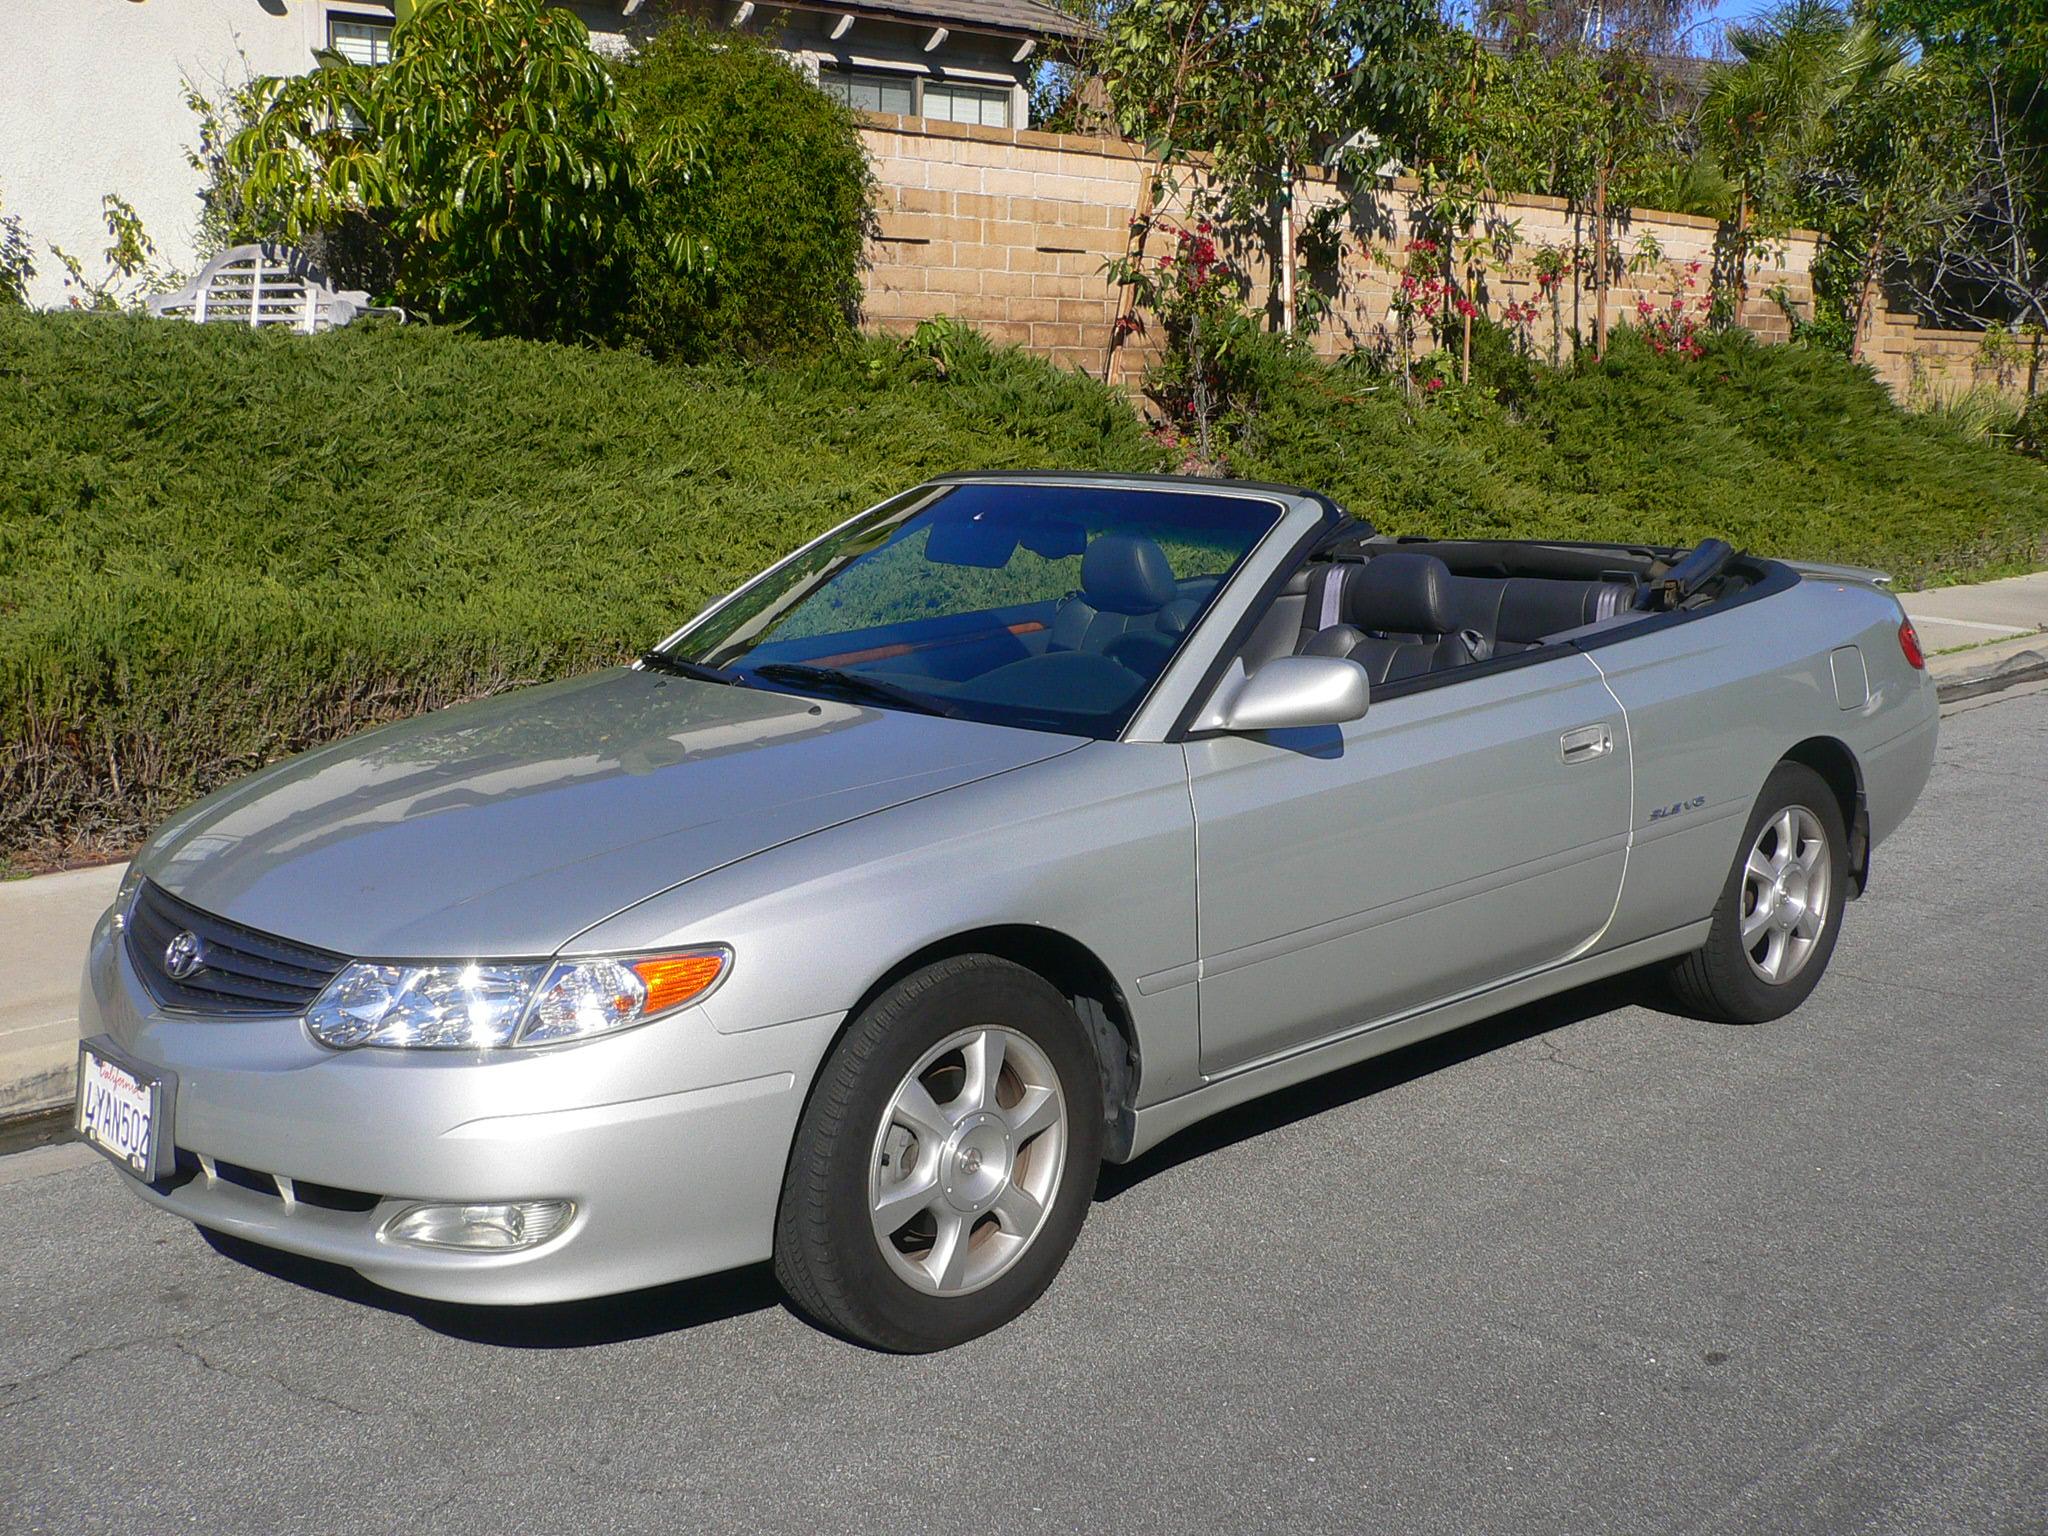 2003 toyota solara sle 109 473 miles v6 automatic convertible alloy wheels